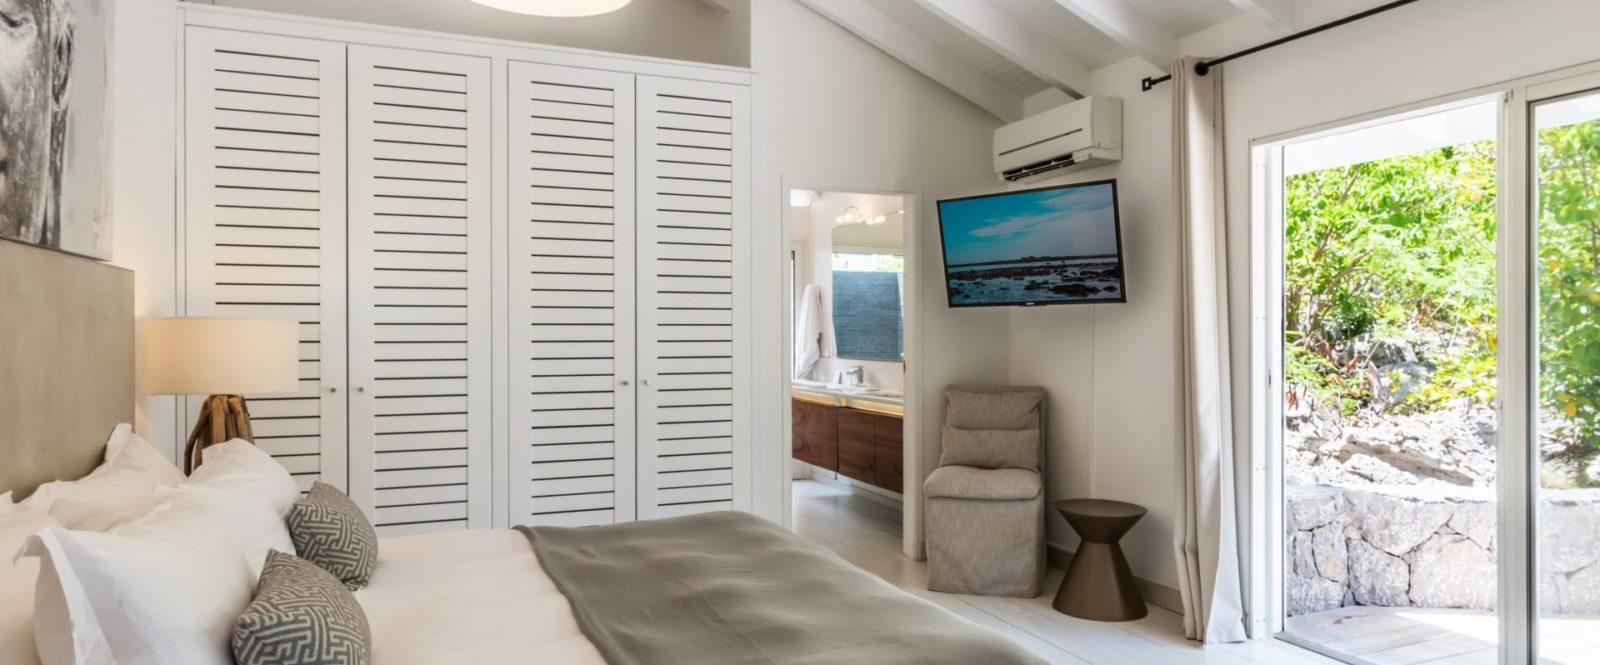 AVALON - villa-avalon-jeanne-le-menn-bedroom-1-1